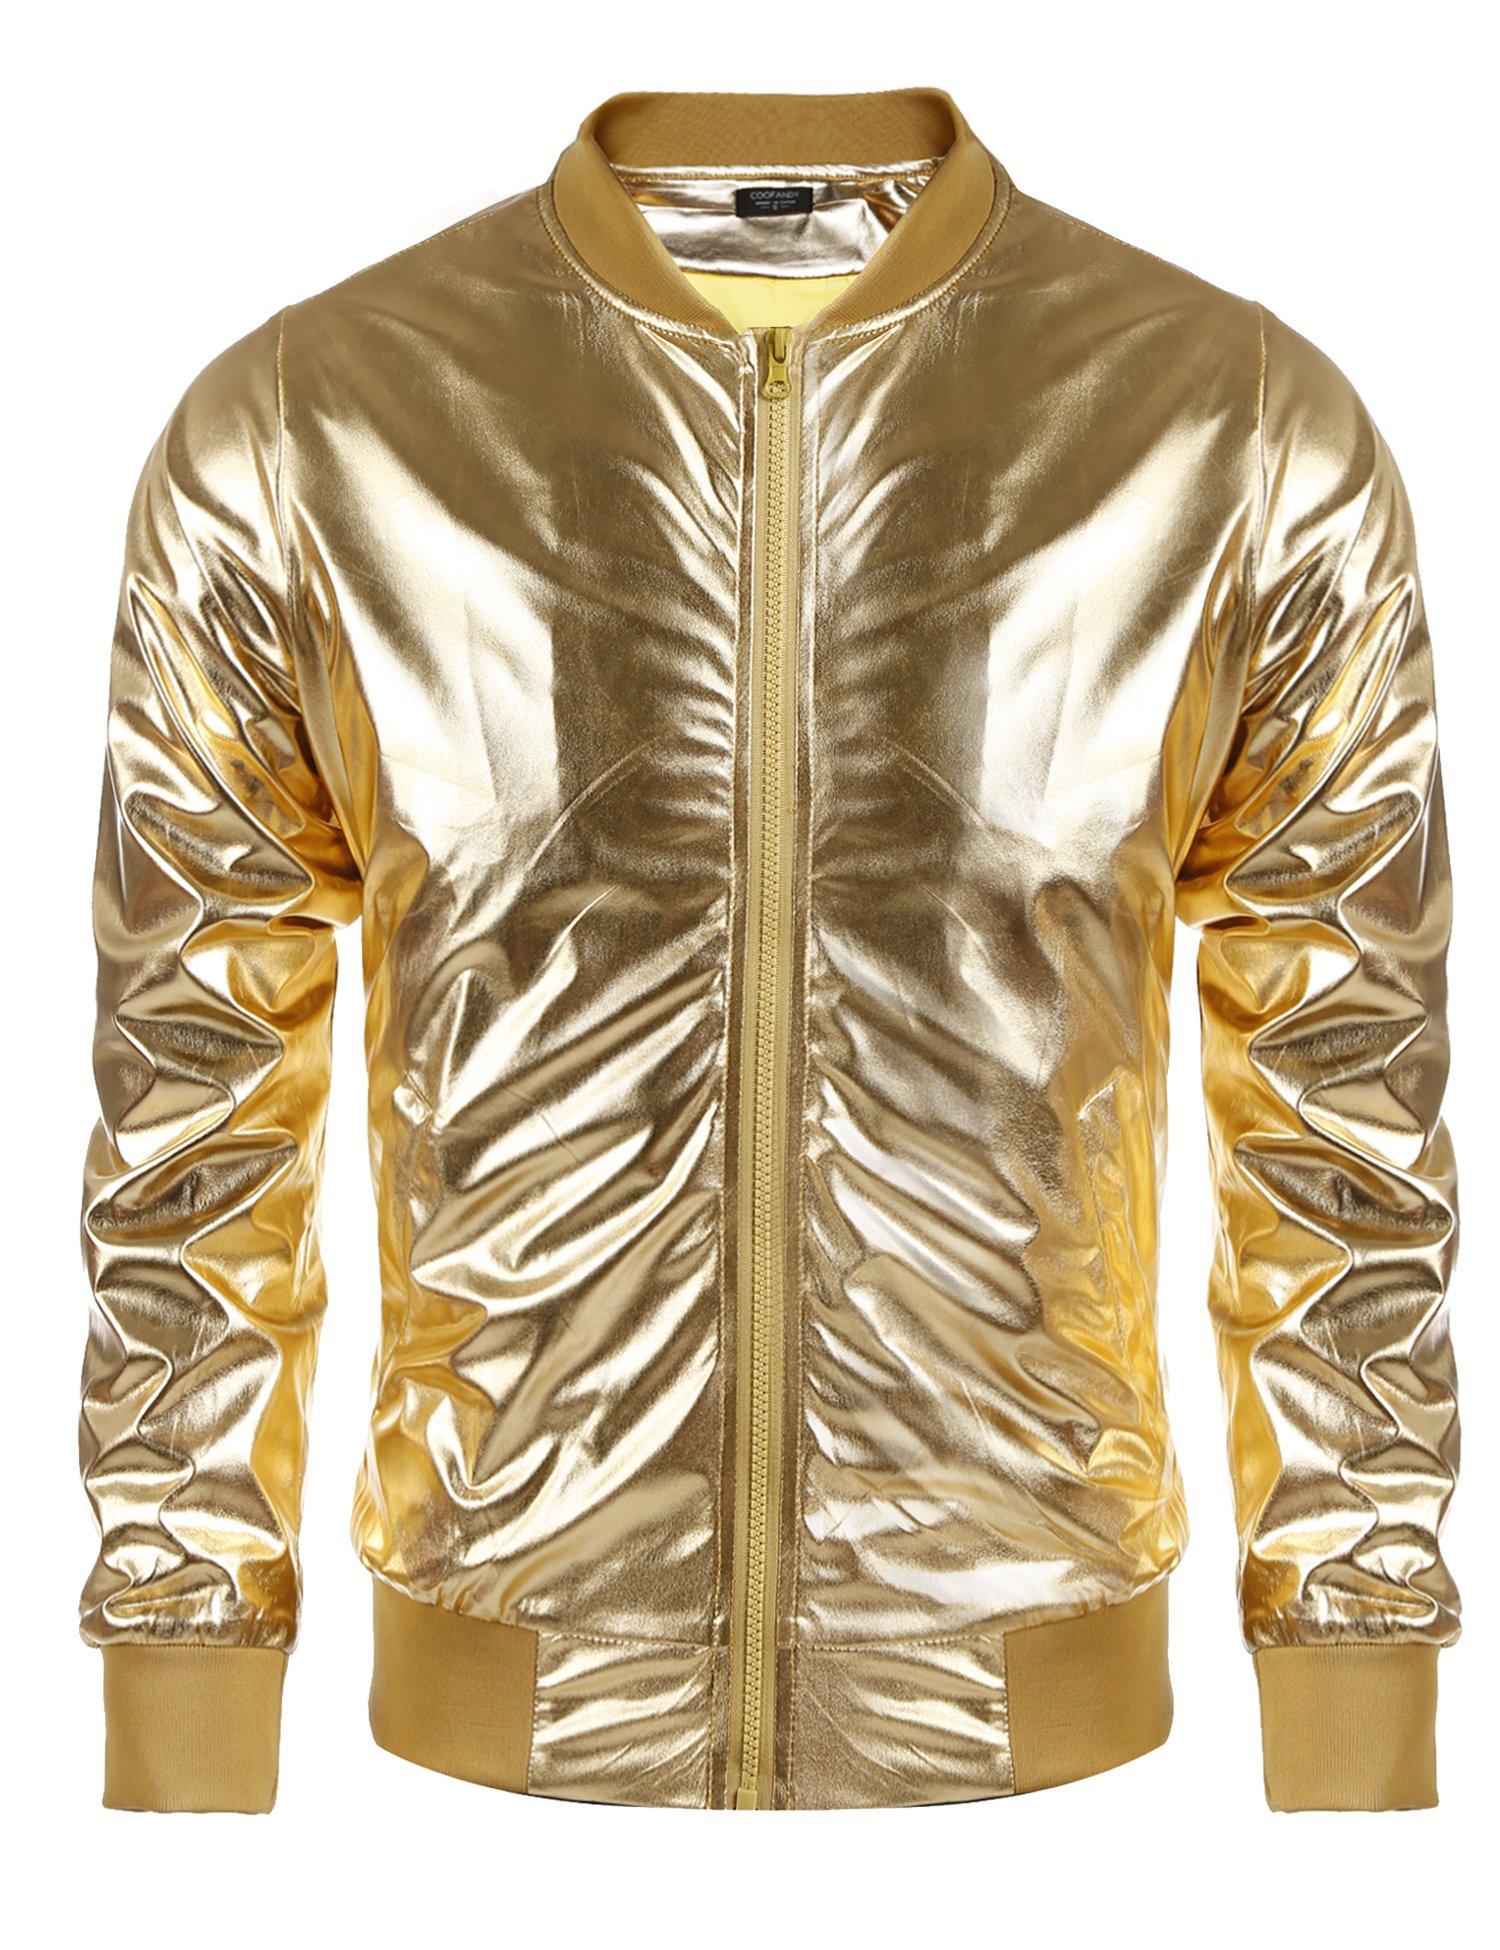 Coofandy Men's Metallic Style Baseball Varsity Bomber Jacket For Party,Nightclub,Halloween, Golden, X-Large by COOFANDY